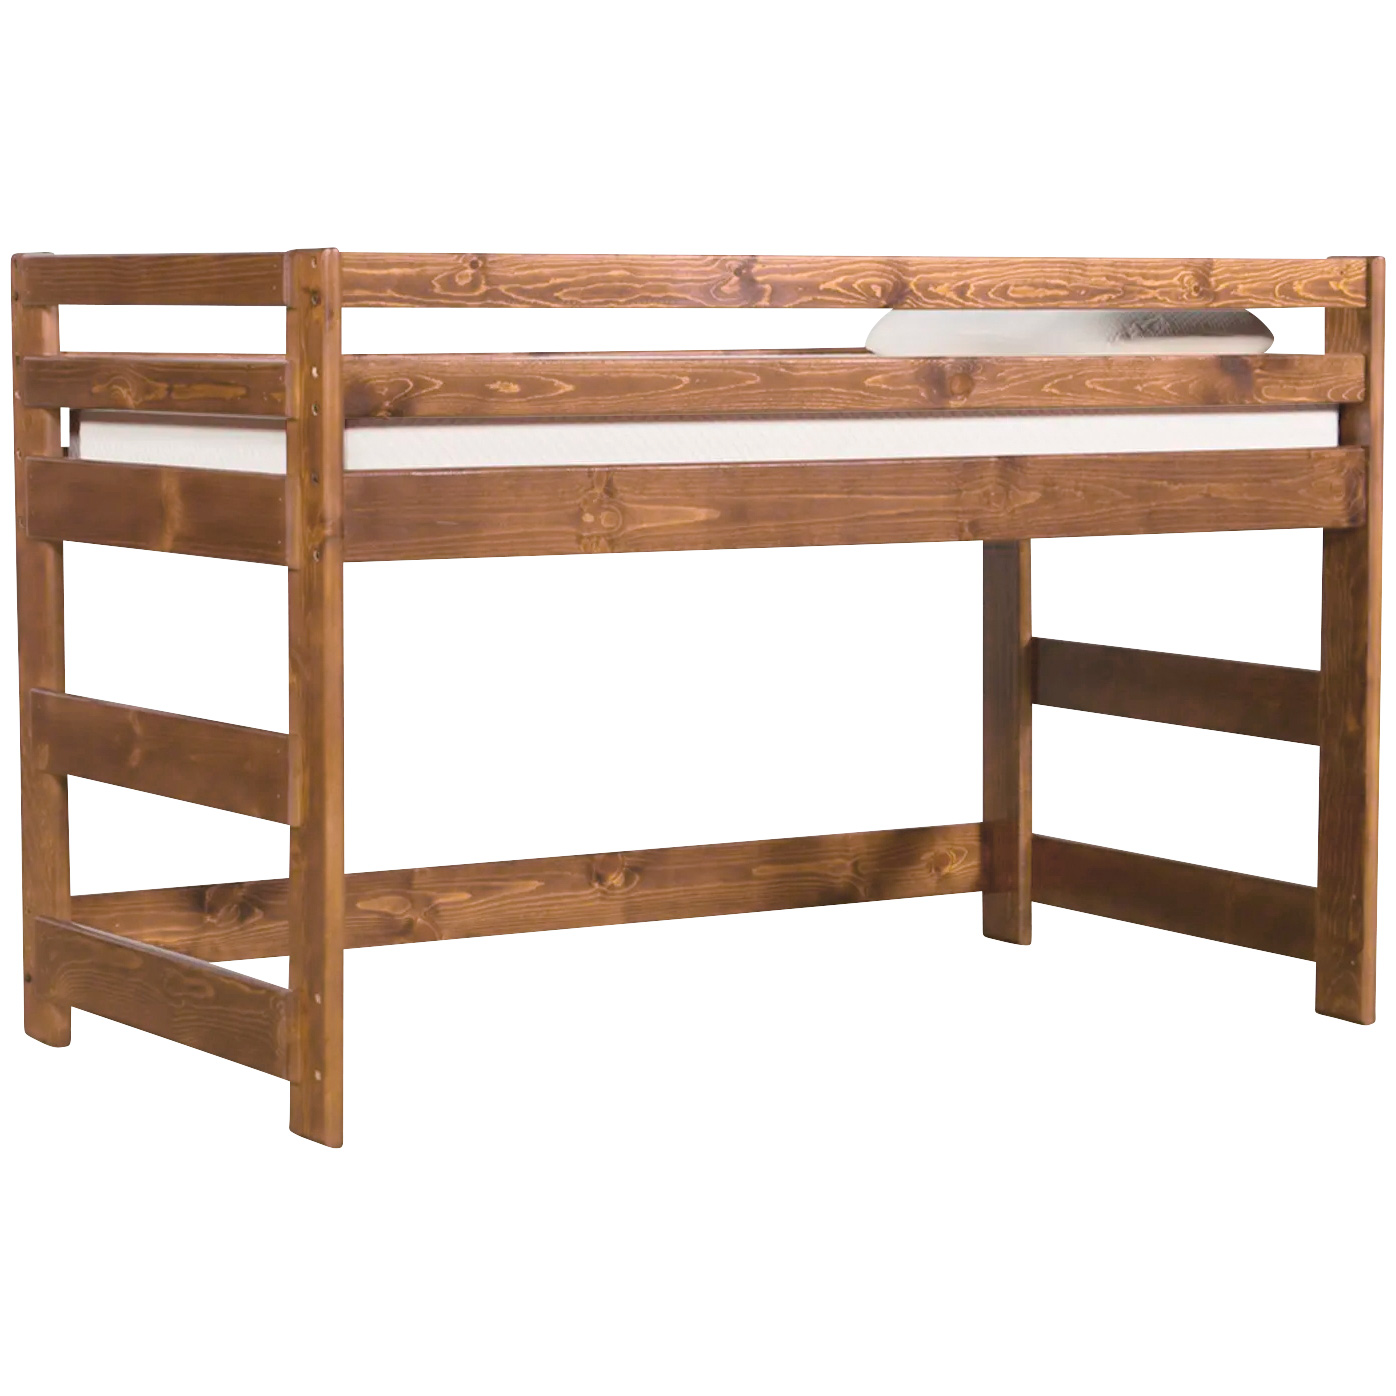 Trendwood Inc. | Bayview Buckskin Loft Bed